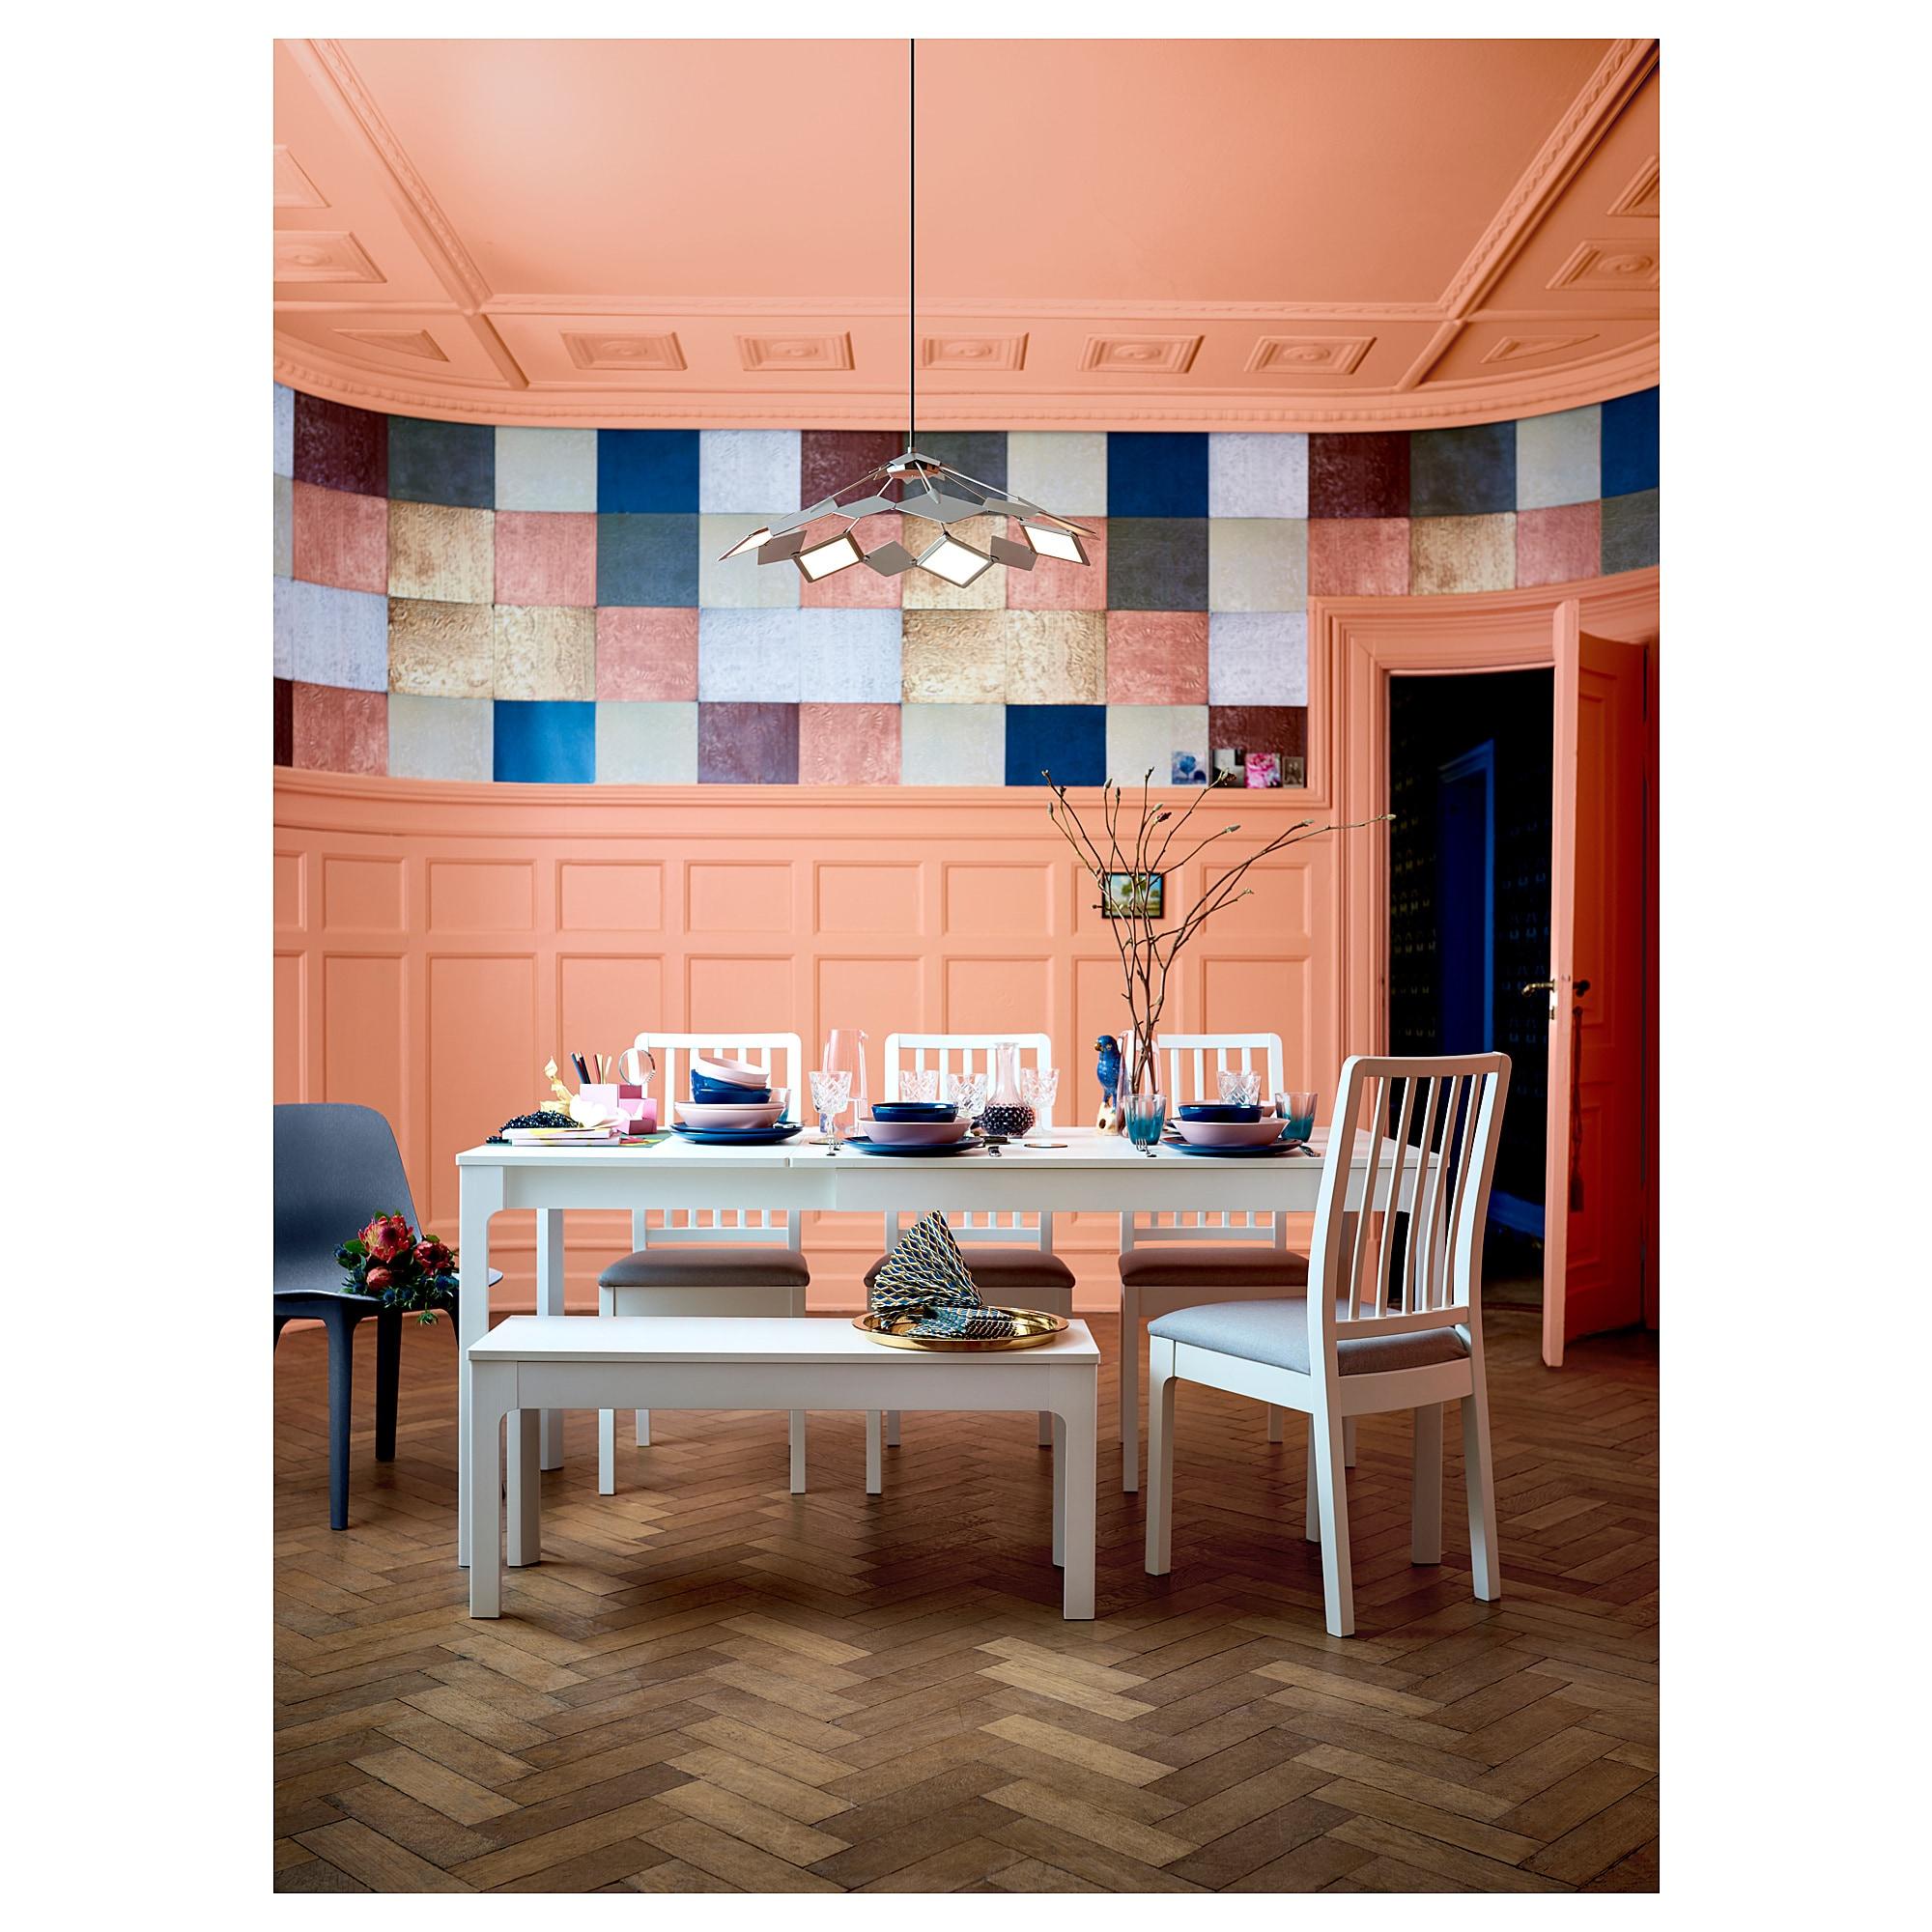 Furniture and Home Furnishings Ikea, Table, Ikea